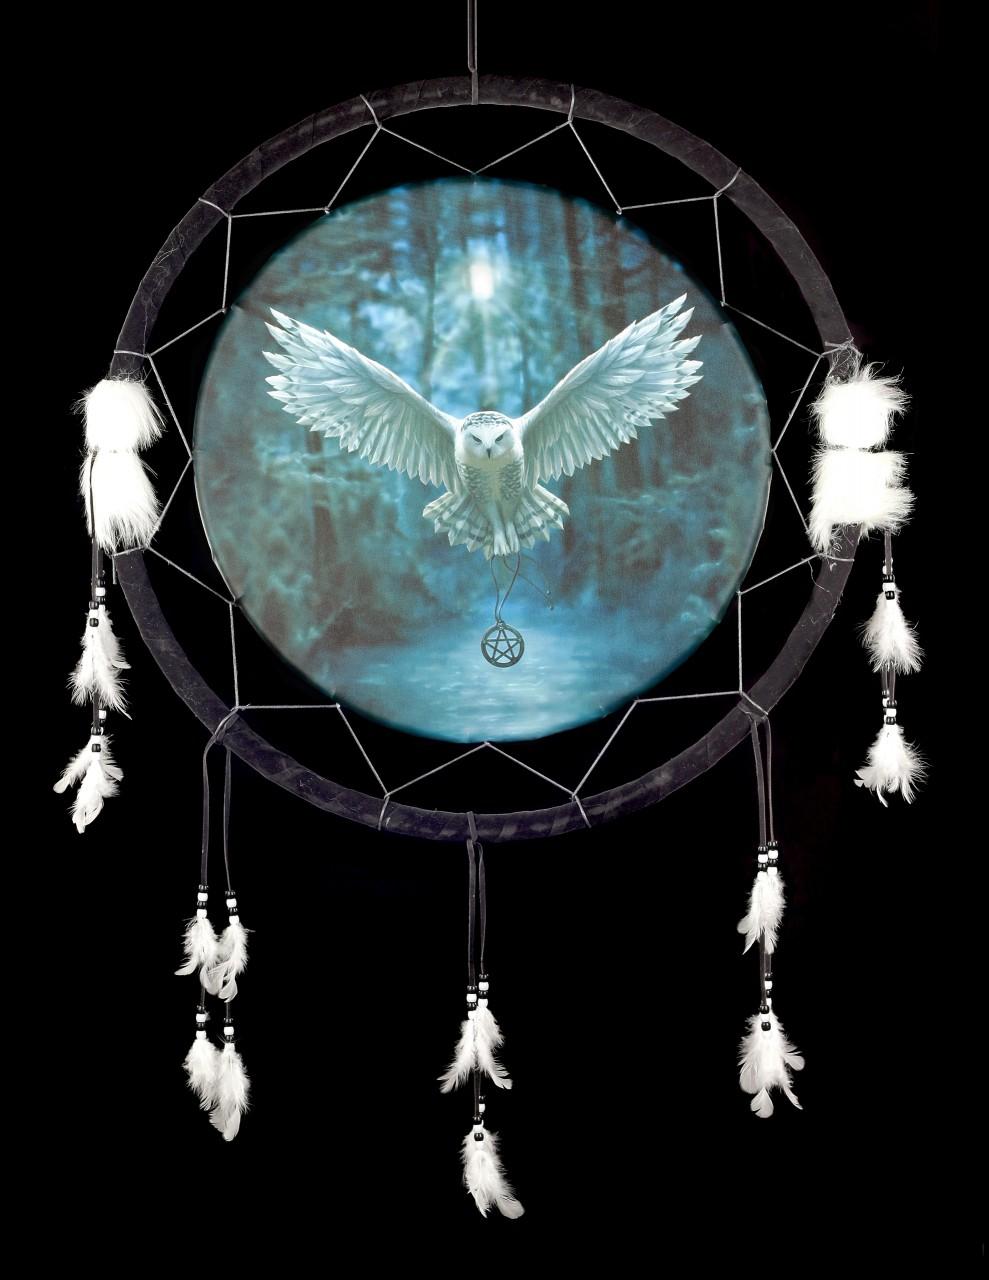 Large Dreamcatcher - Awaken your Magic